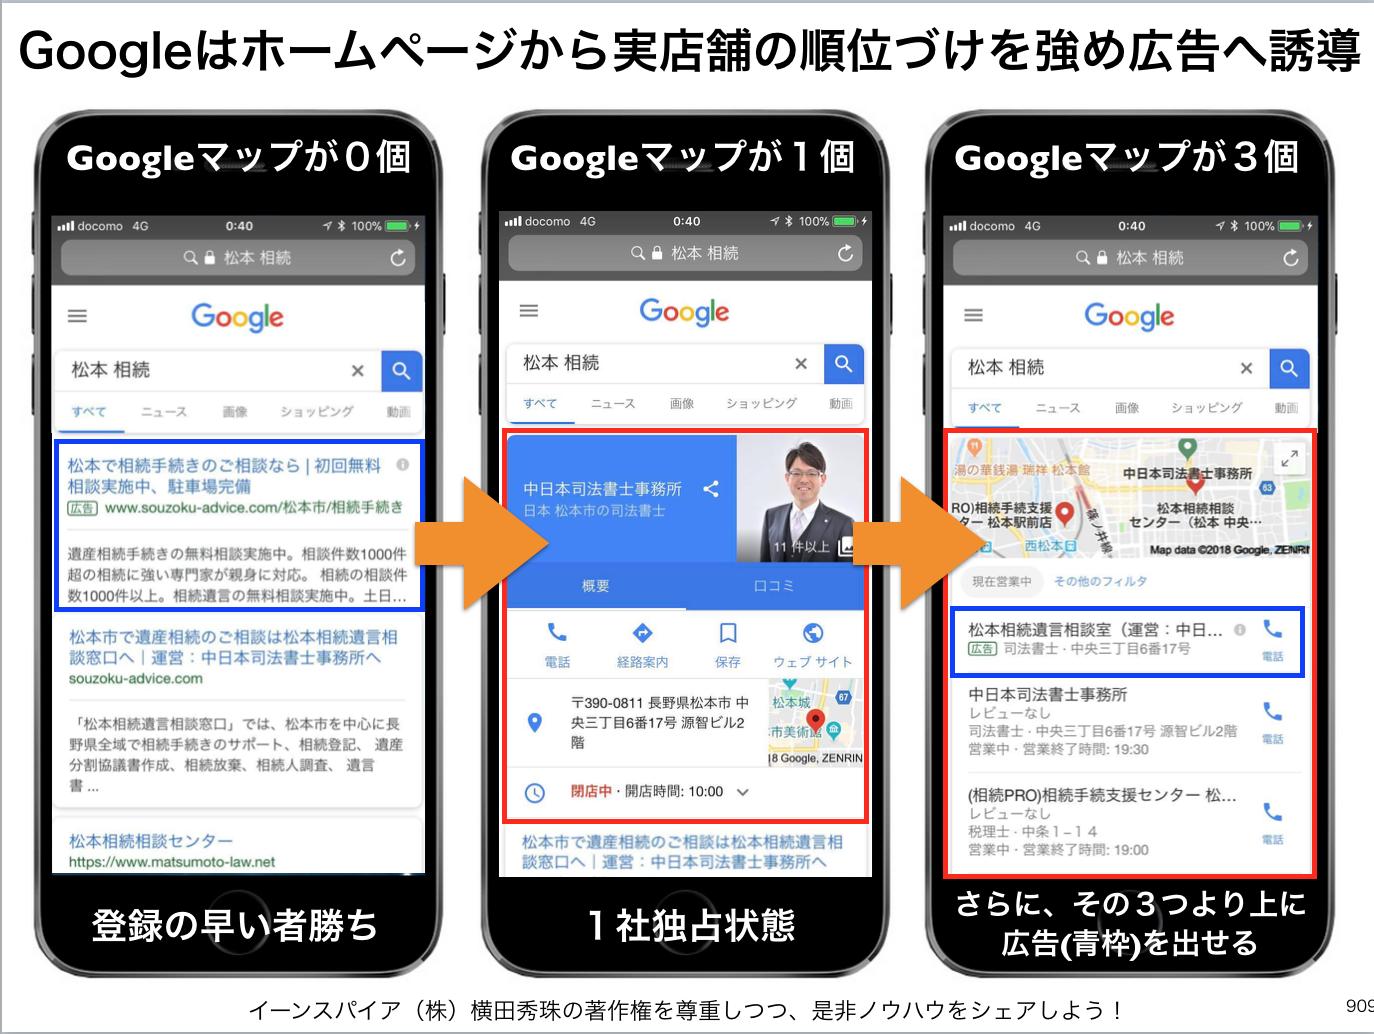 Googleはホームページから実店舗の順位づけを強め広告へ誘導